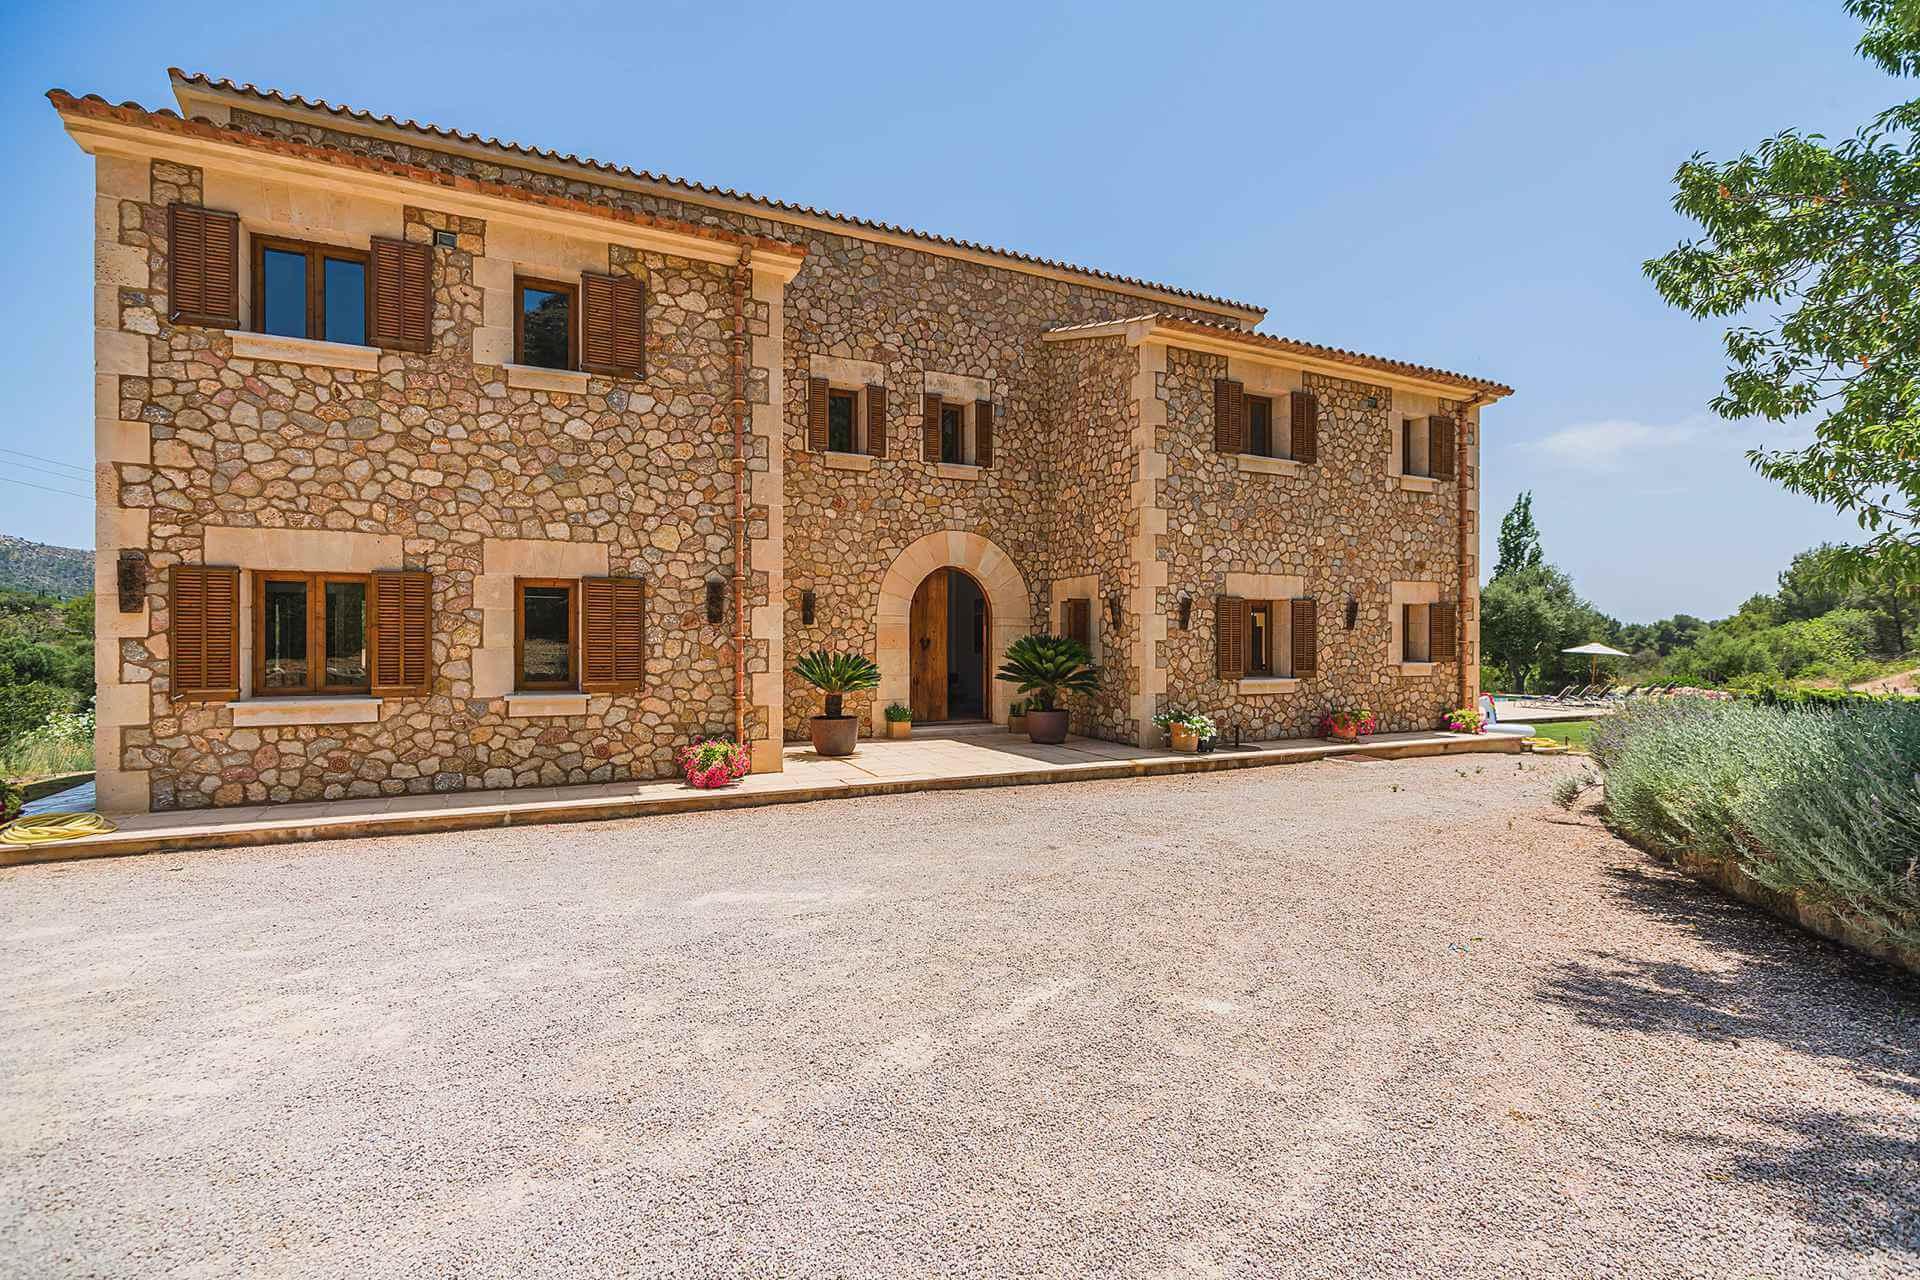 01-348 Luxury Family Finca Mallorca North Bild 10